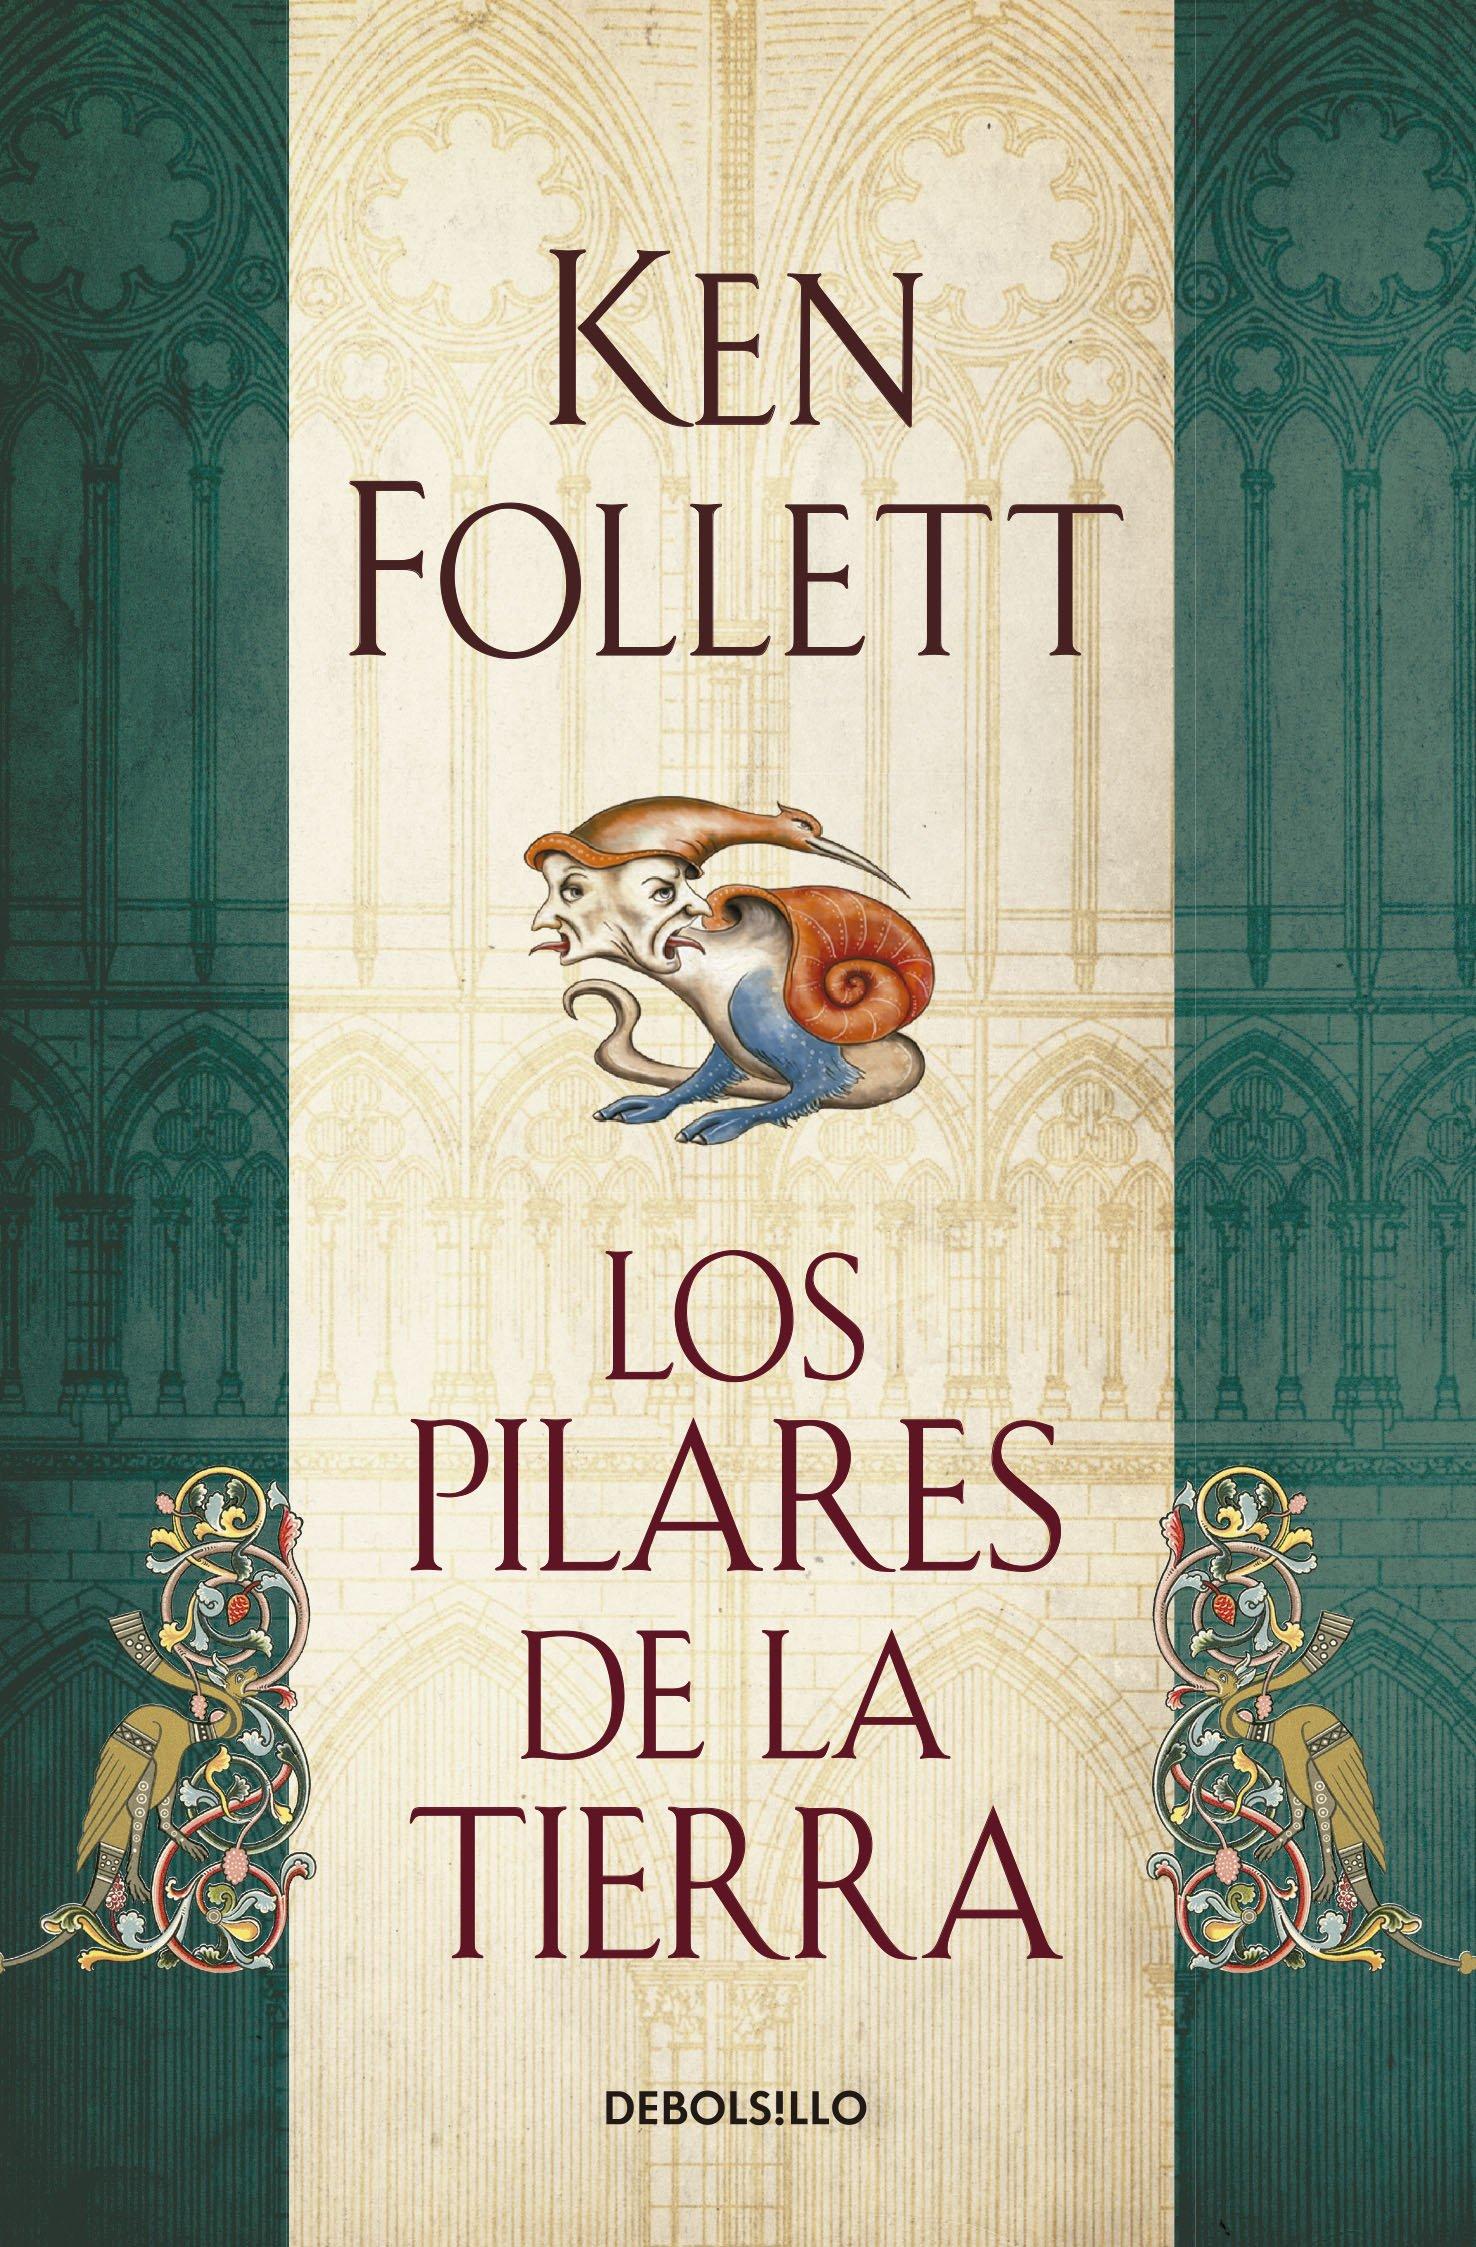 Los Pilares De La Tierra Los Pilares De La Tierra 1 Follett Ken Amazon Com Mx Libros